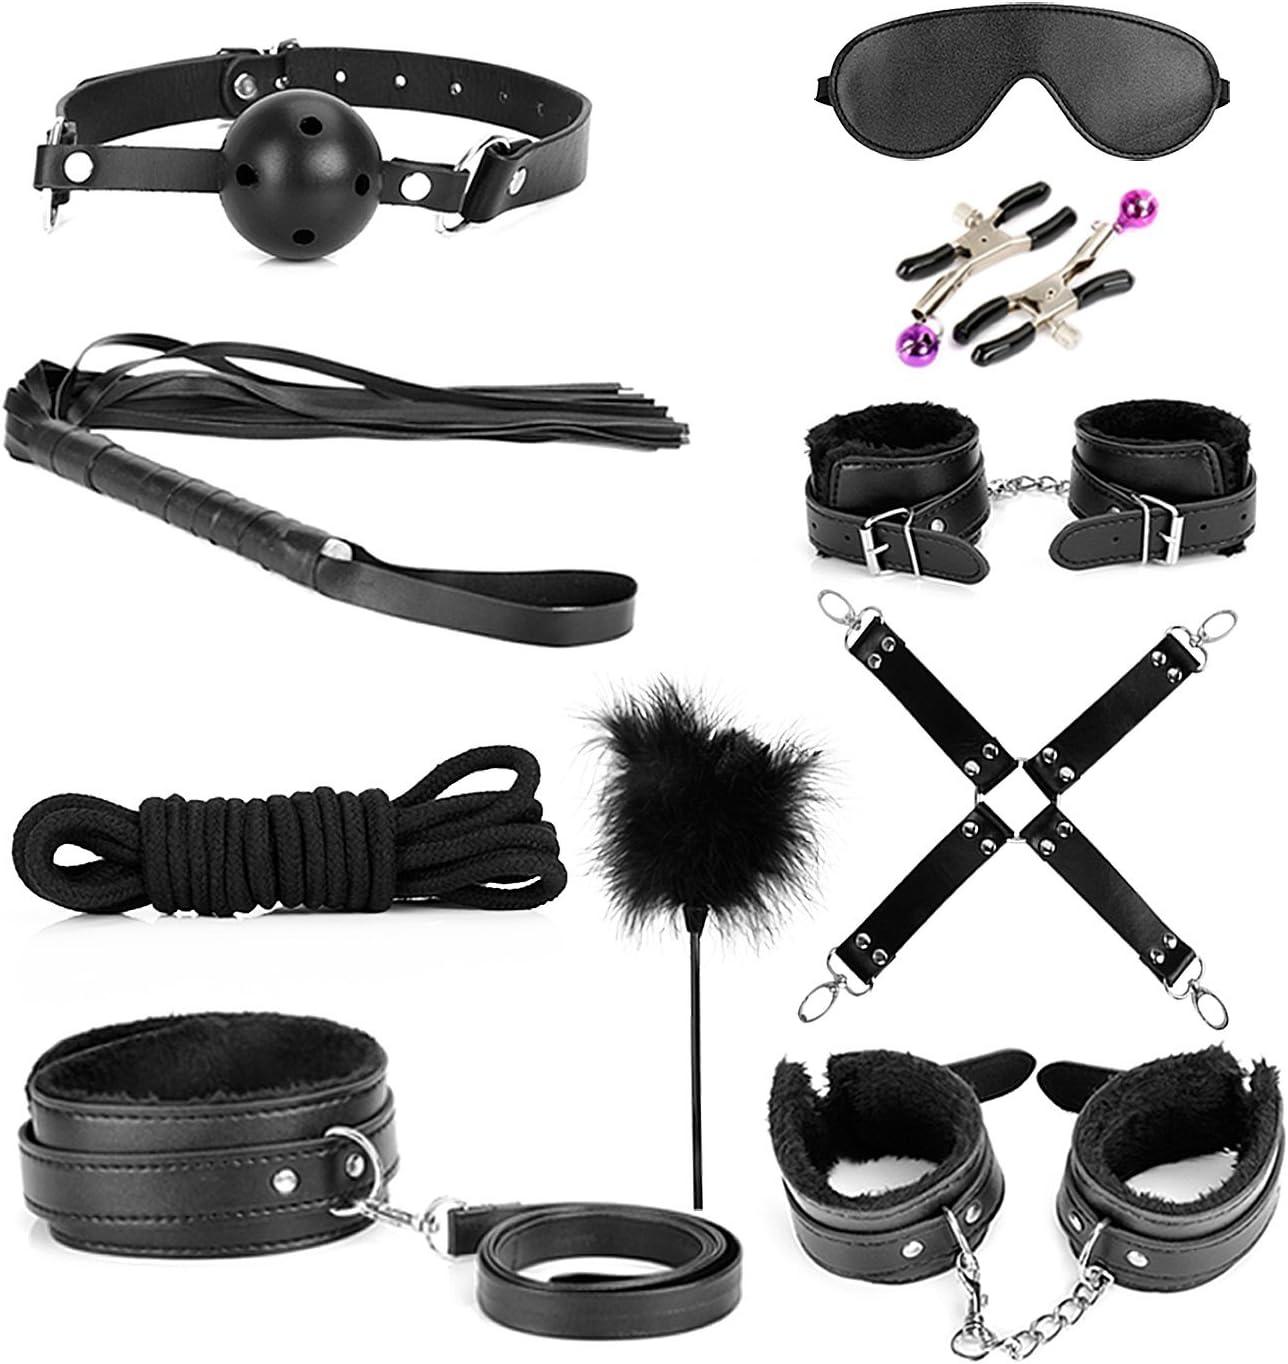 Bondage photo sets Amazon Com Bondage Kit 10 Piece Set Love Cuffs Black Health Household